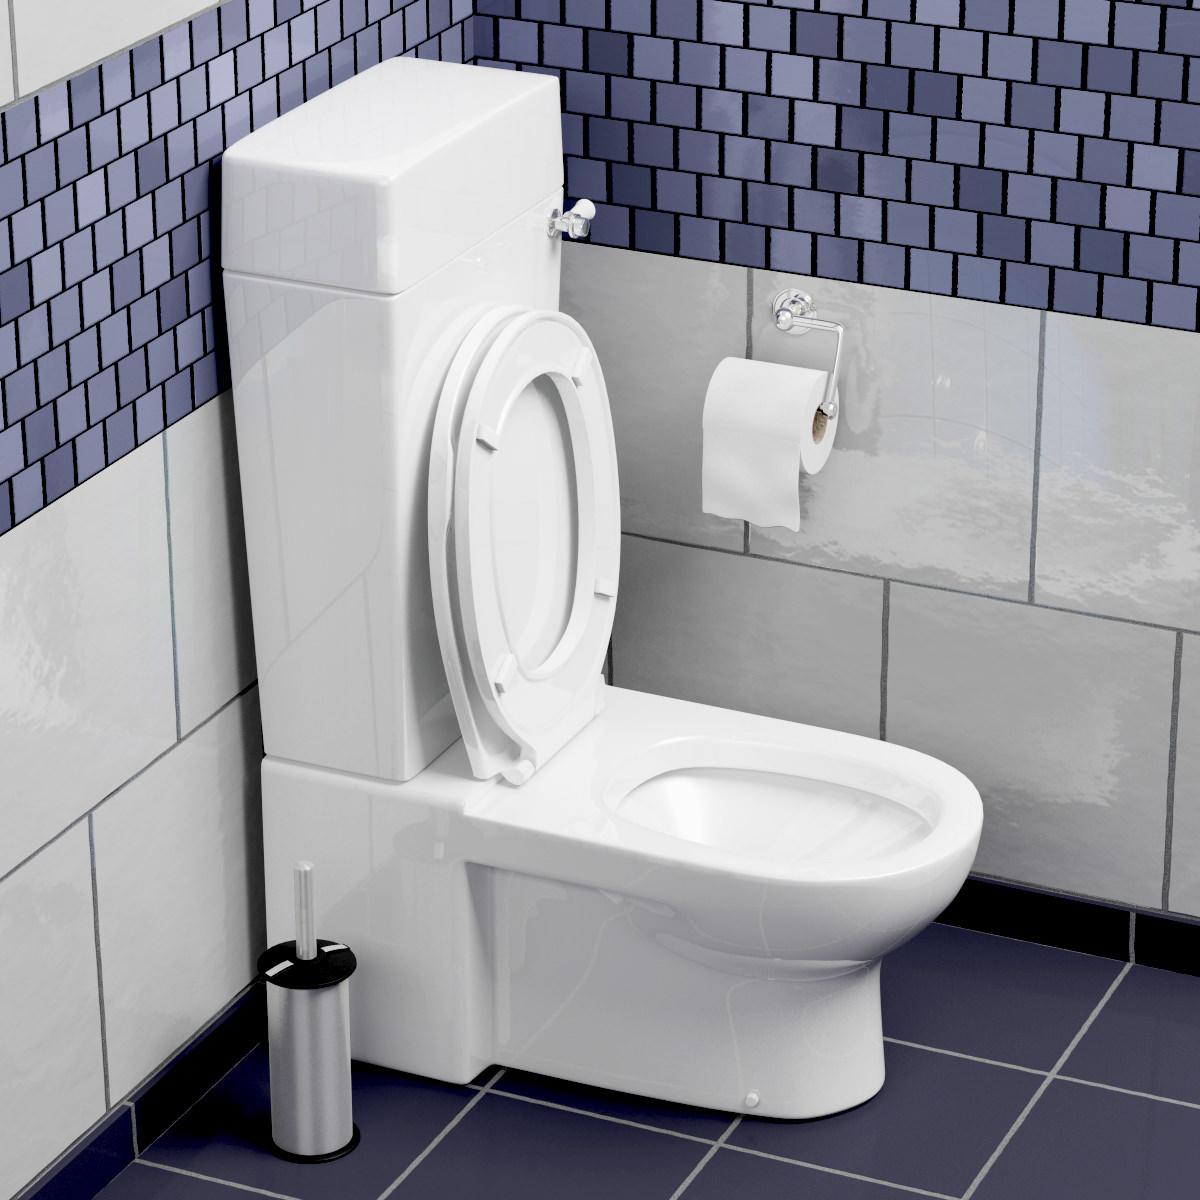 toilet 3d model max obj fbx. Black Bedroom Furniture Sets. Home Design Ideas